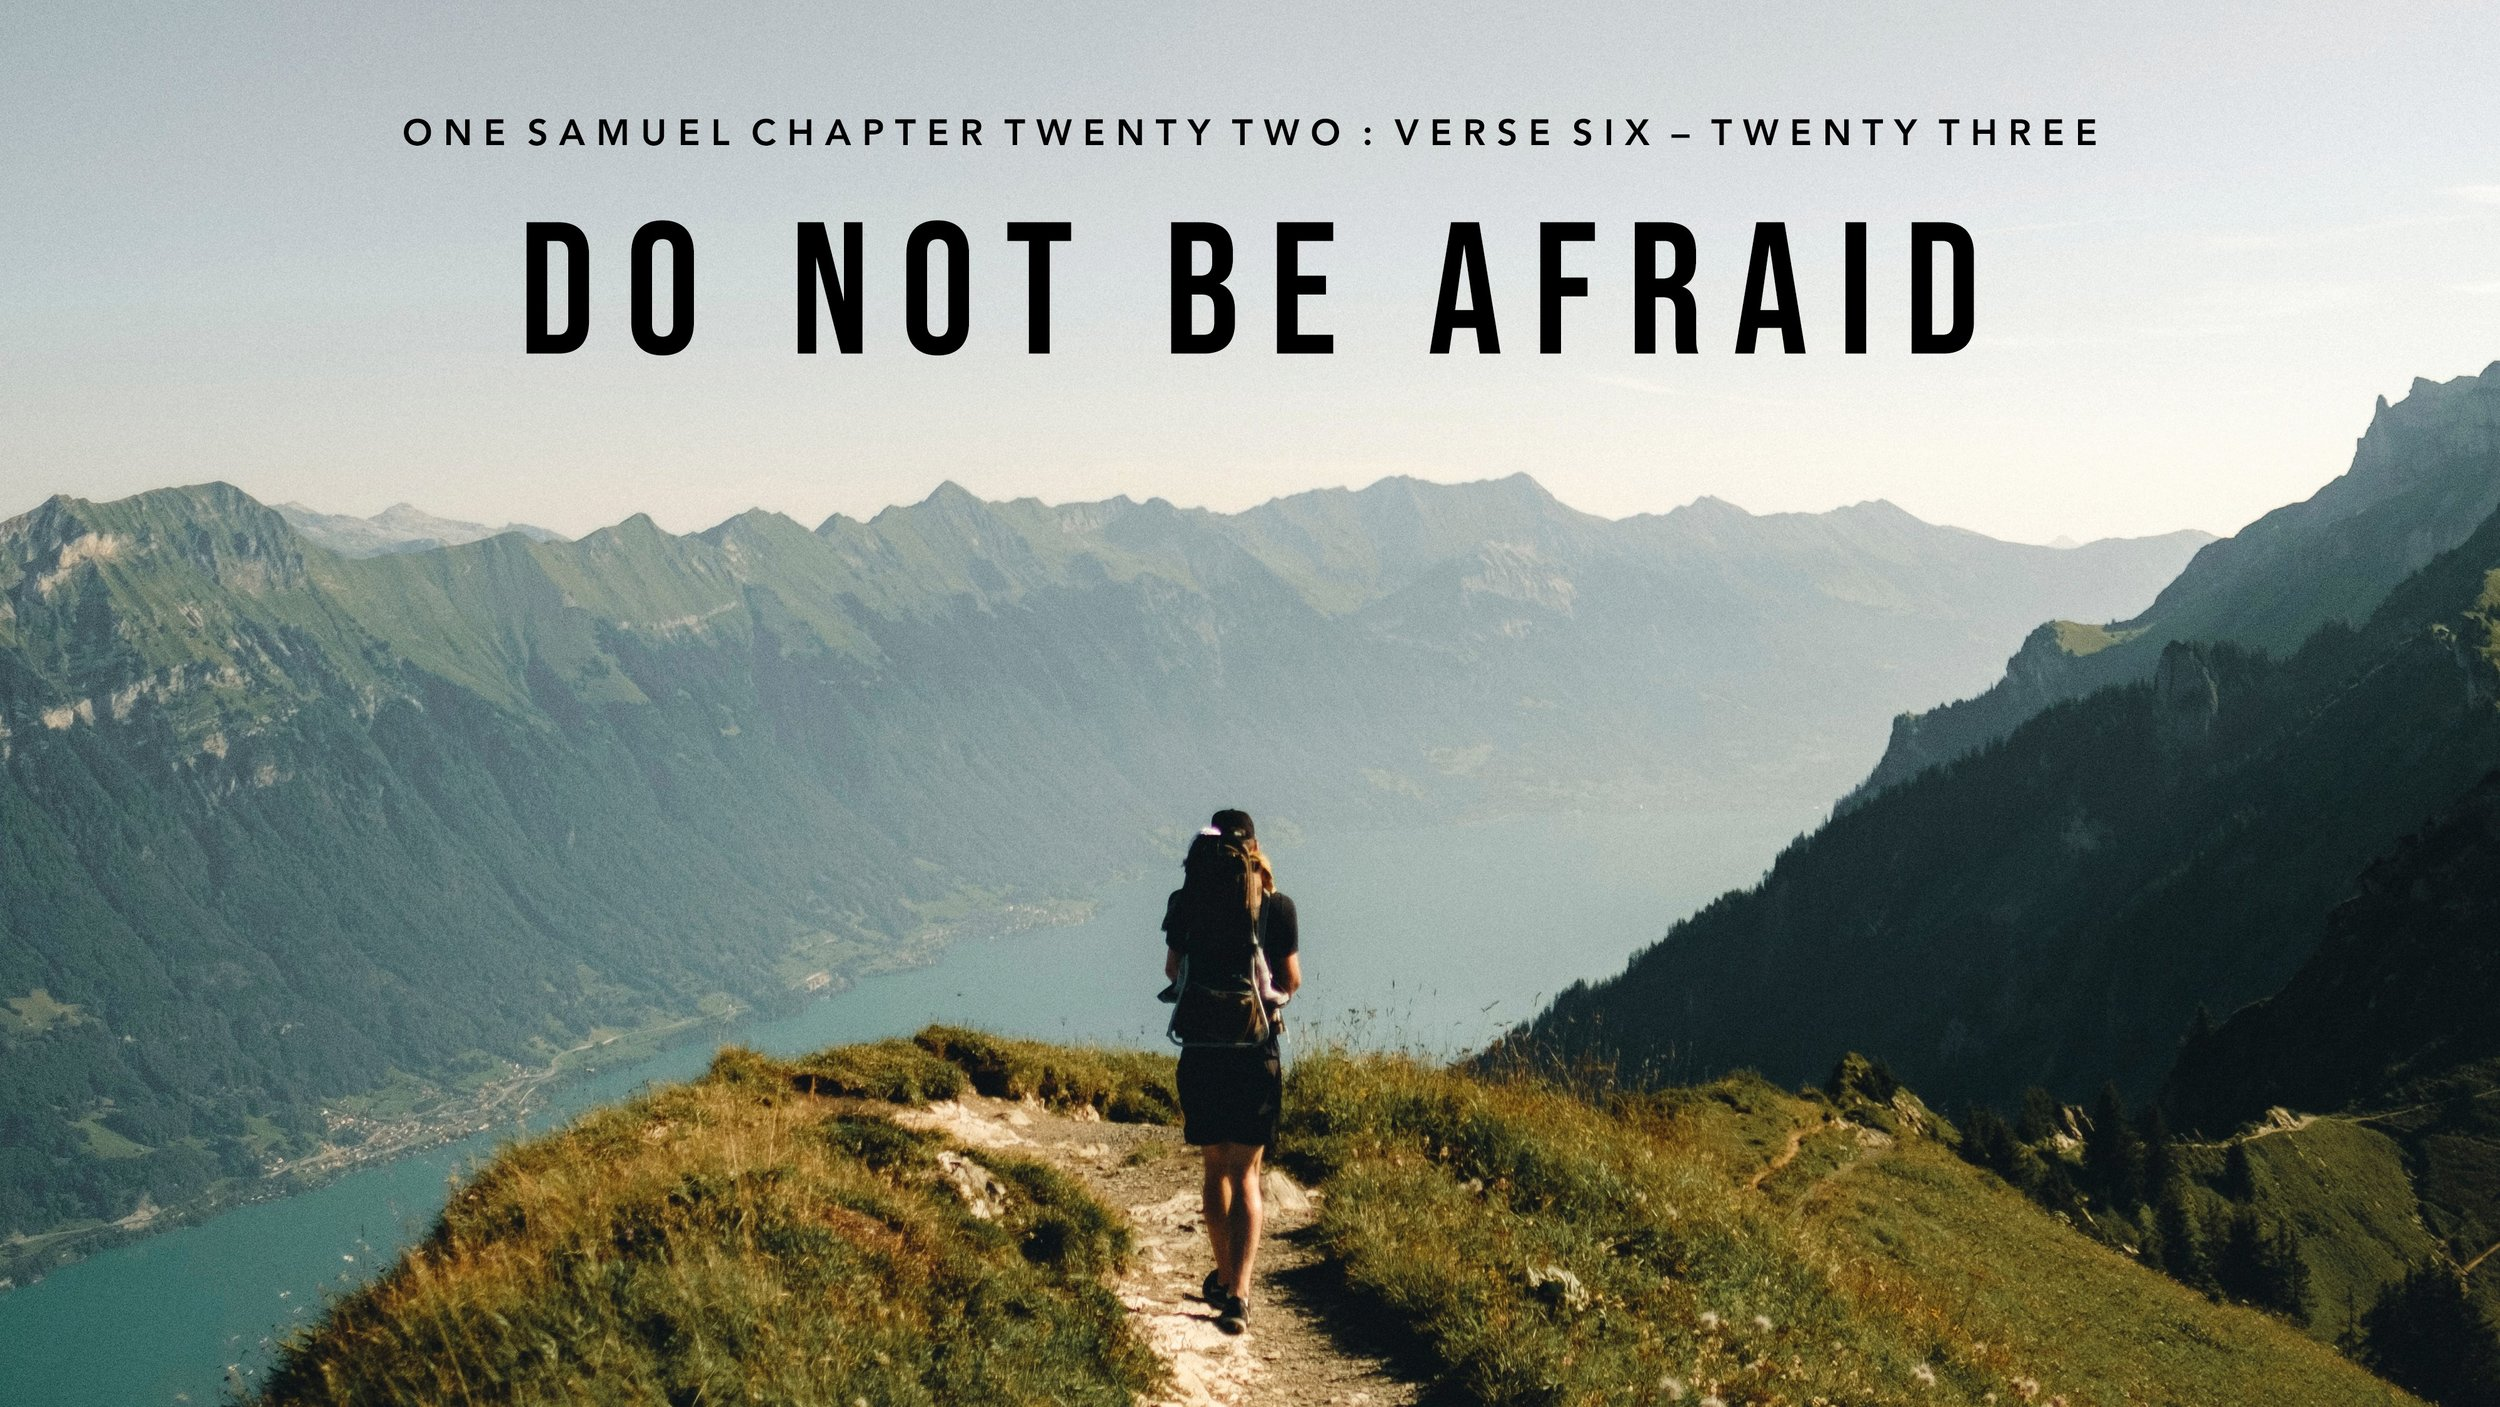 Do Not Be Afraid - 1 Samuel 22: 6-23